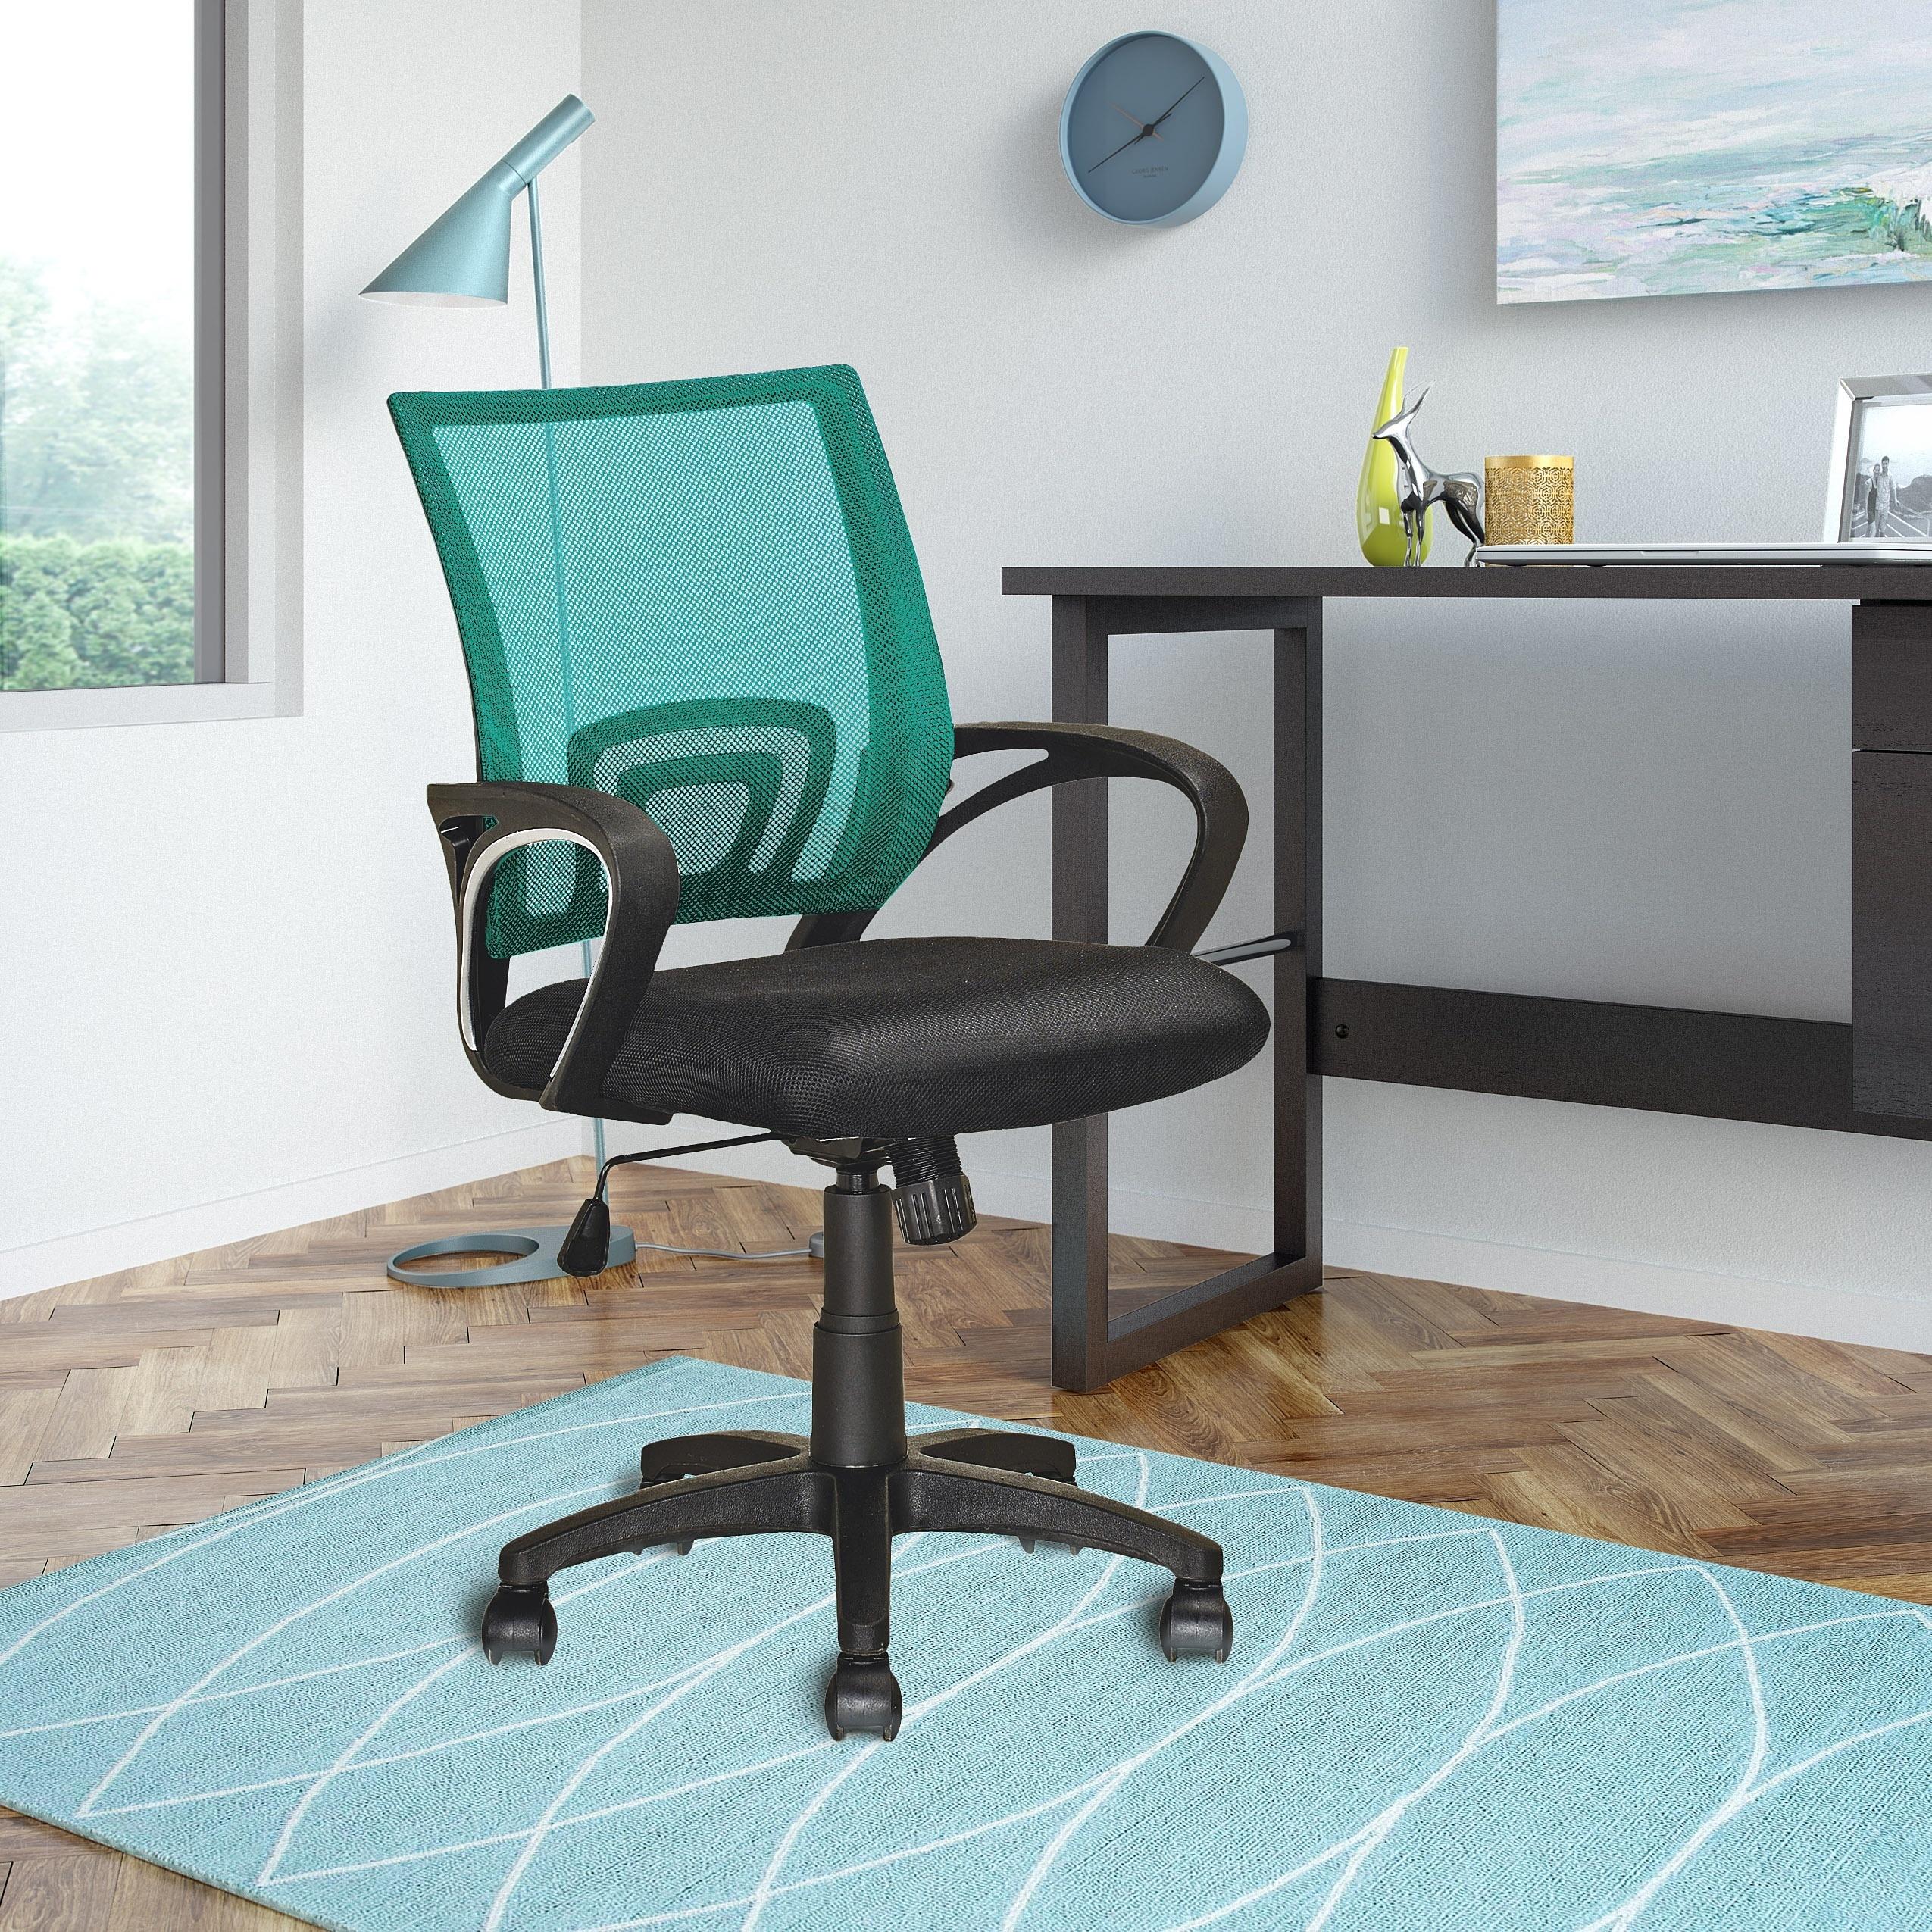 Shop Palm Canyon Morelos Mesh Back Office Chair, Multiple colors ...